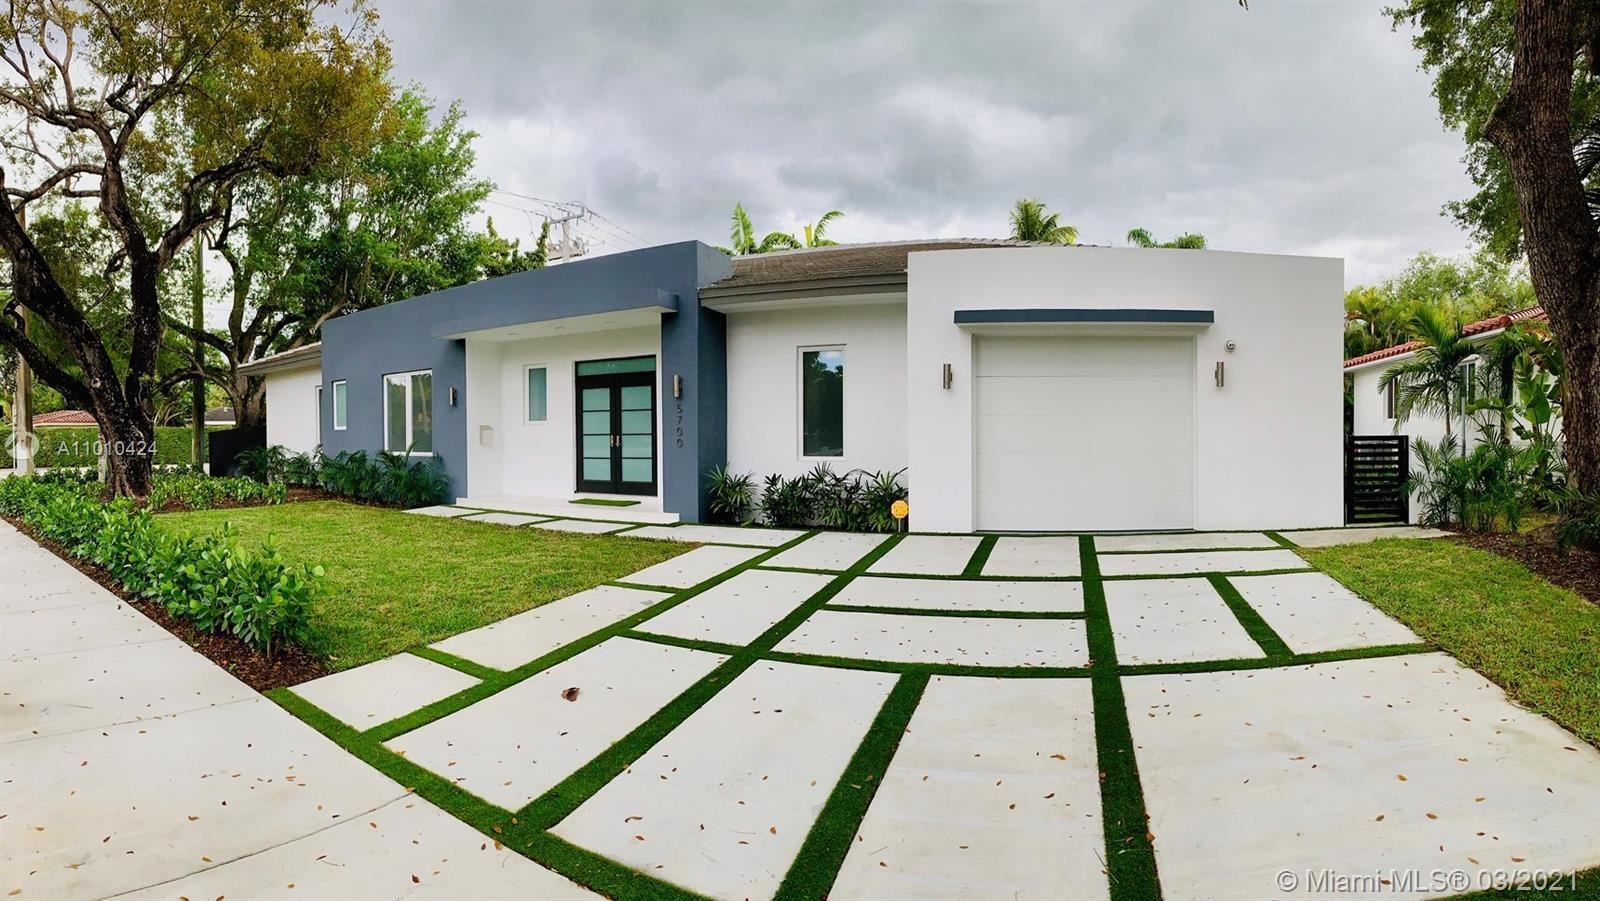 5700 SW 48th St, South Miami, FL 33155 - #: A11010424